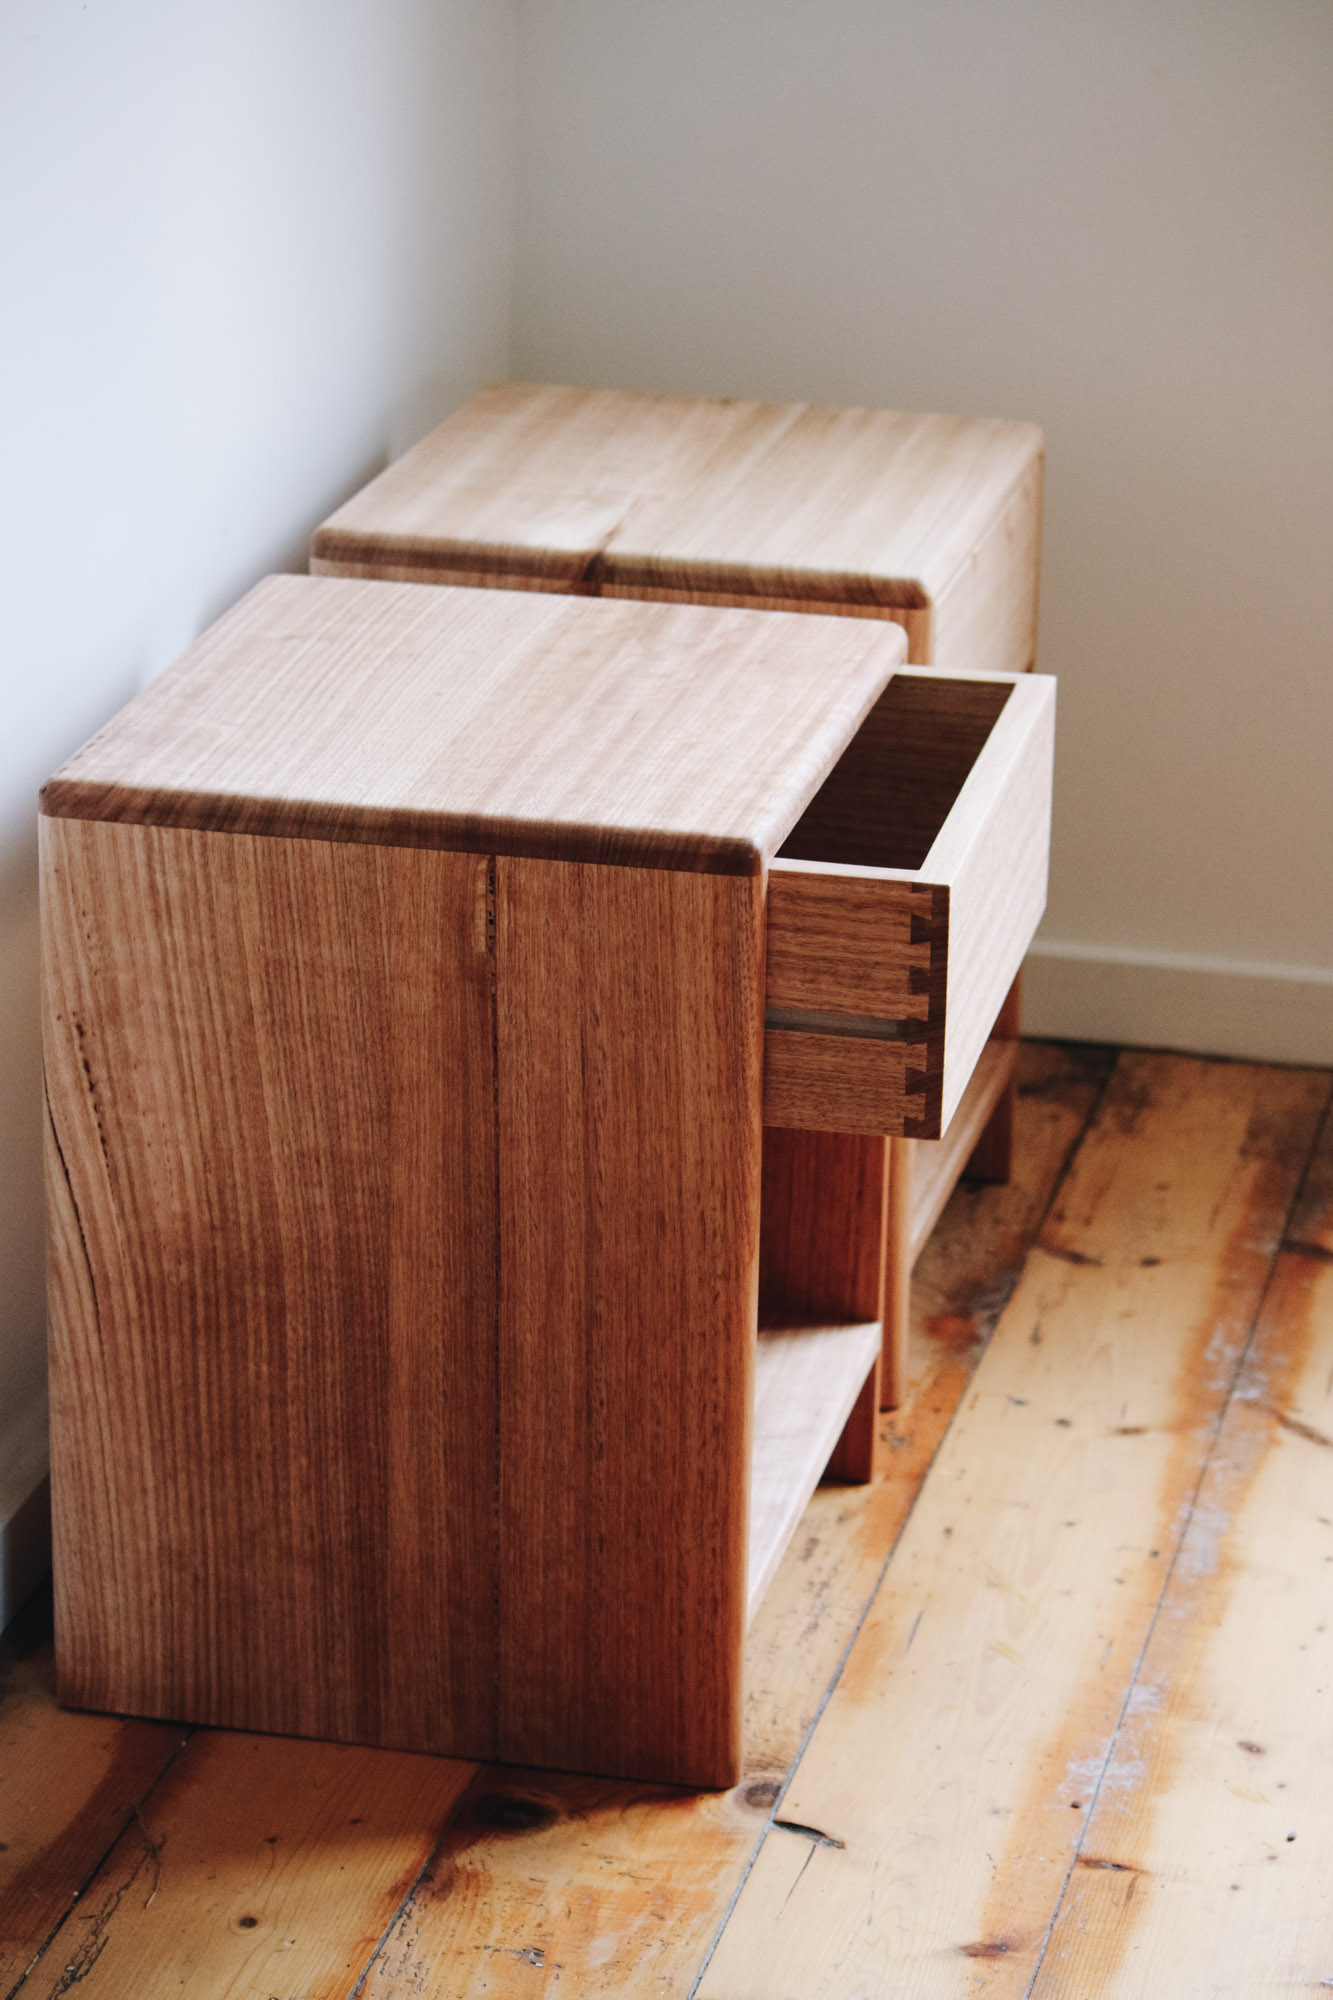 Al and Imo Handmade - Low Bedside Tables - Custom minimalst timber side drawer - Melbourne - Surf Coast - Australia-4.jpg